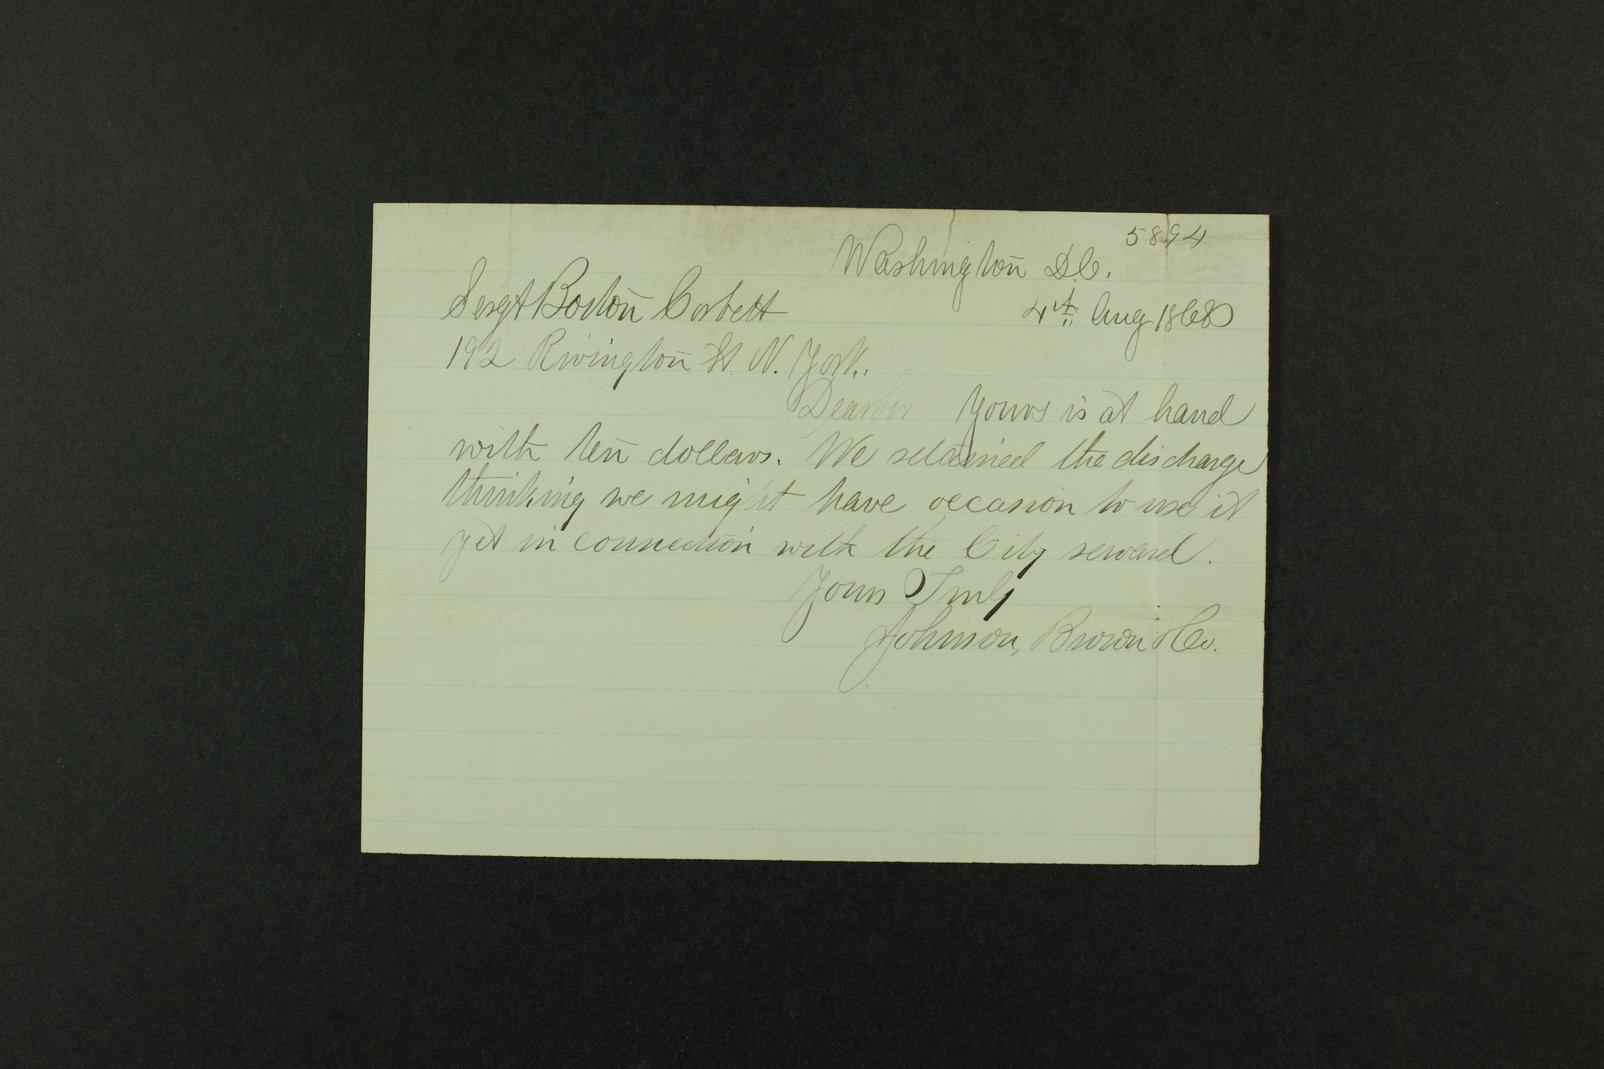 Boston Corbett correspondence - 2